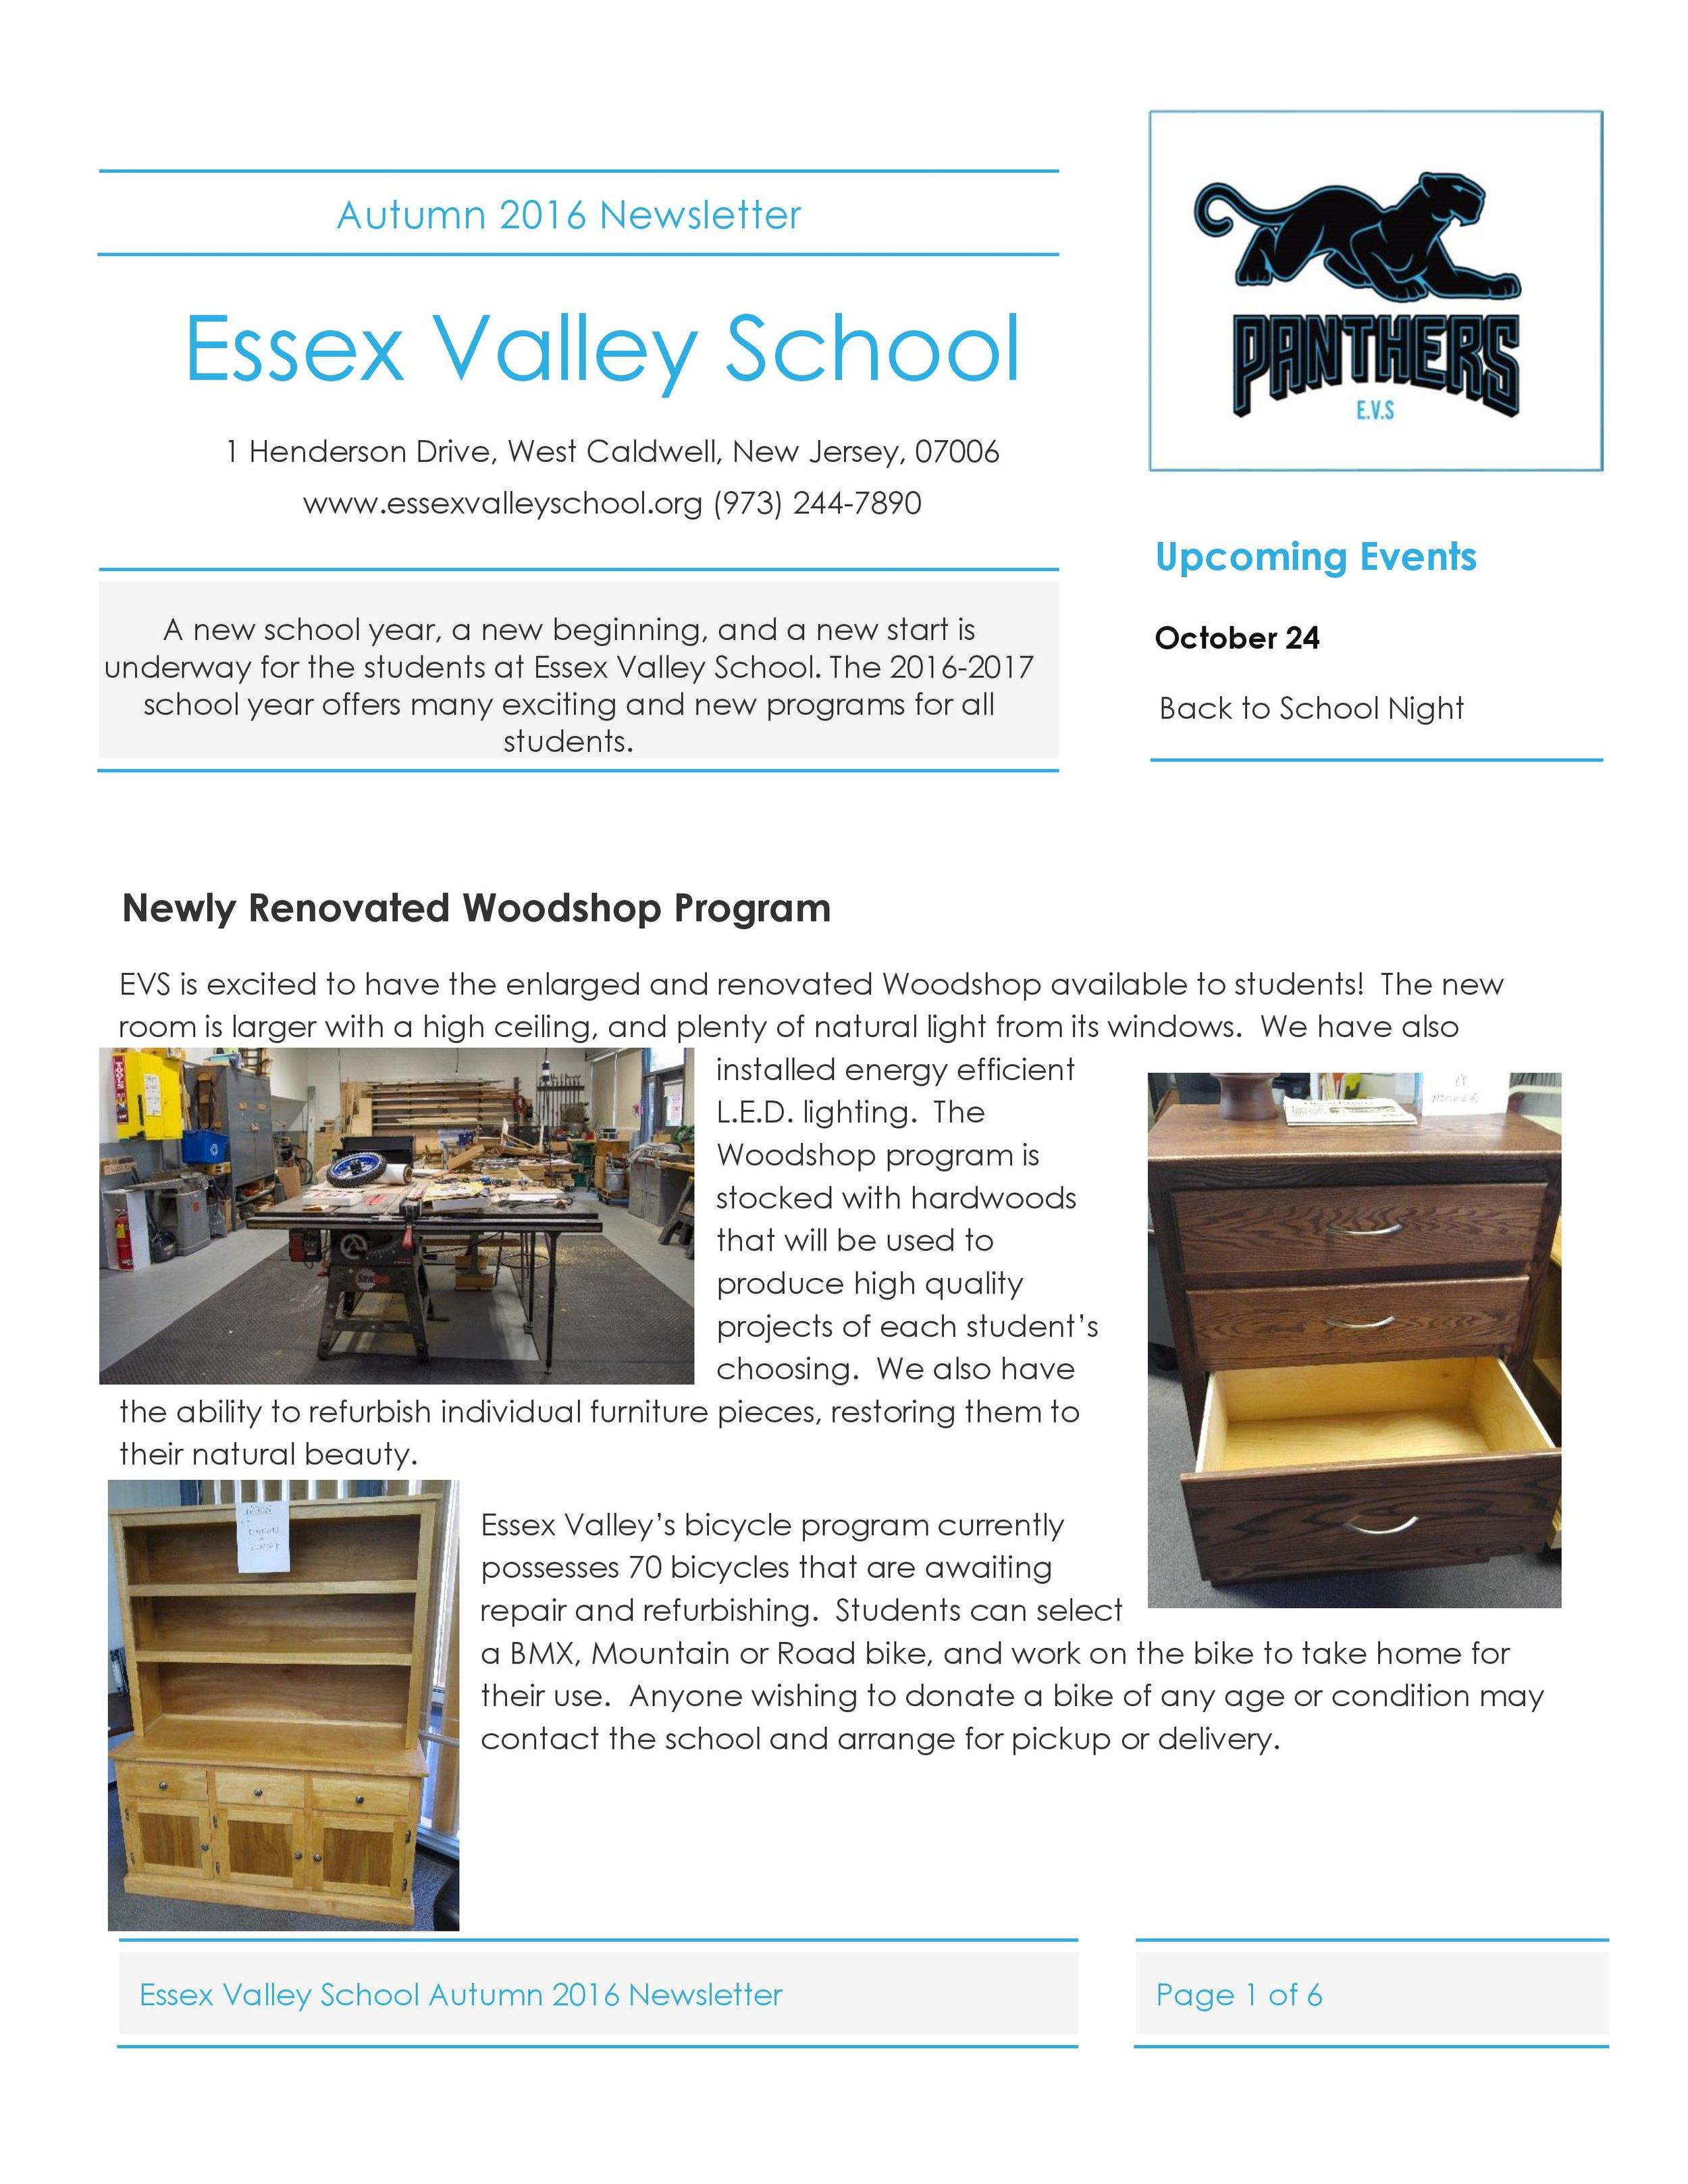 Newsletter Revised 10-18-162 (1)-page-002.jpg